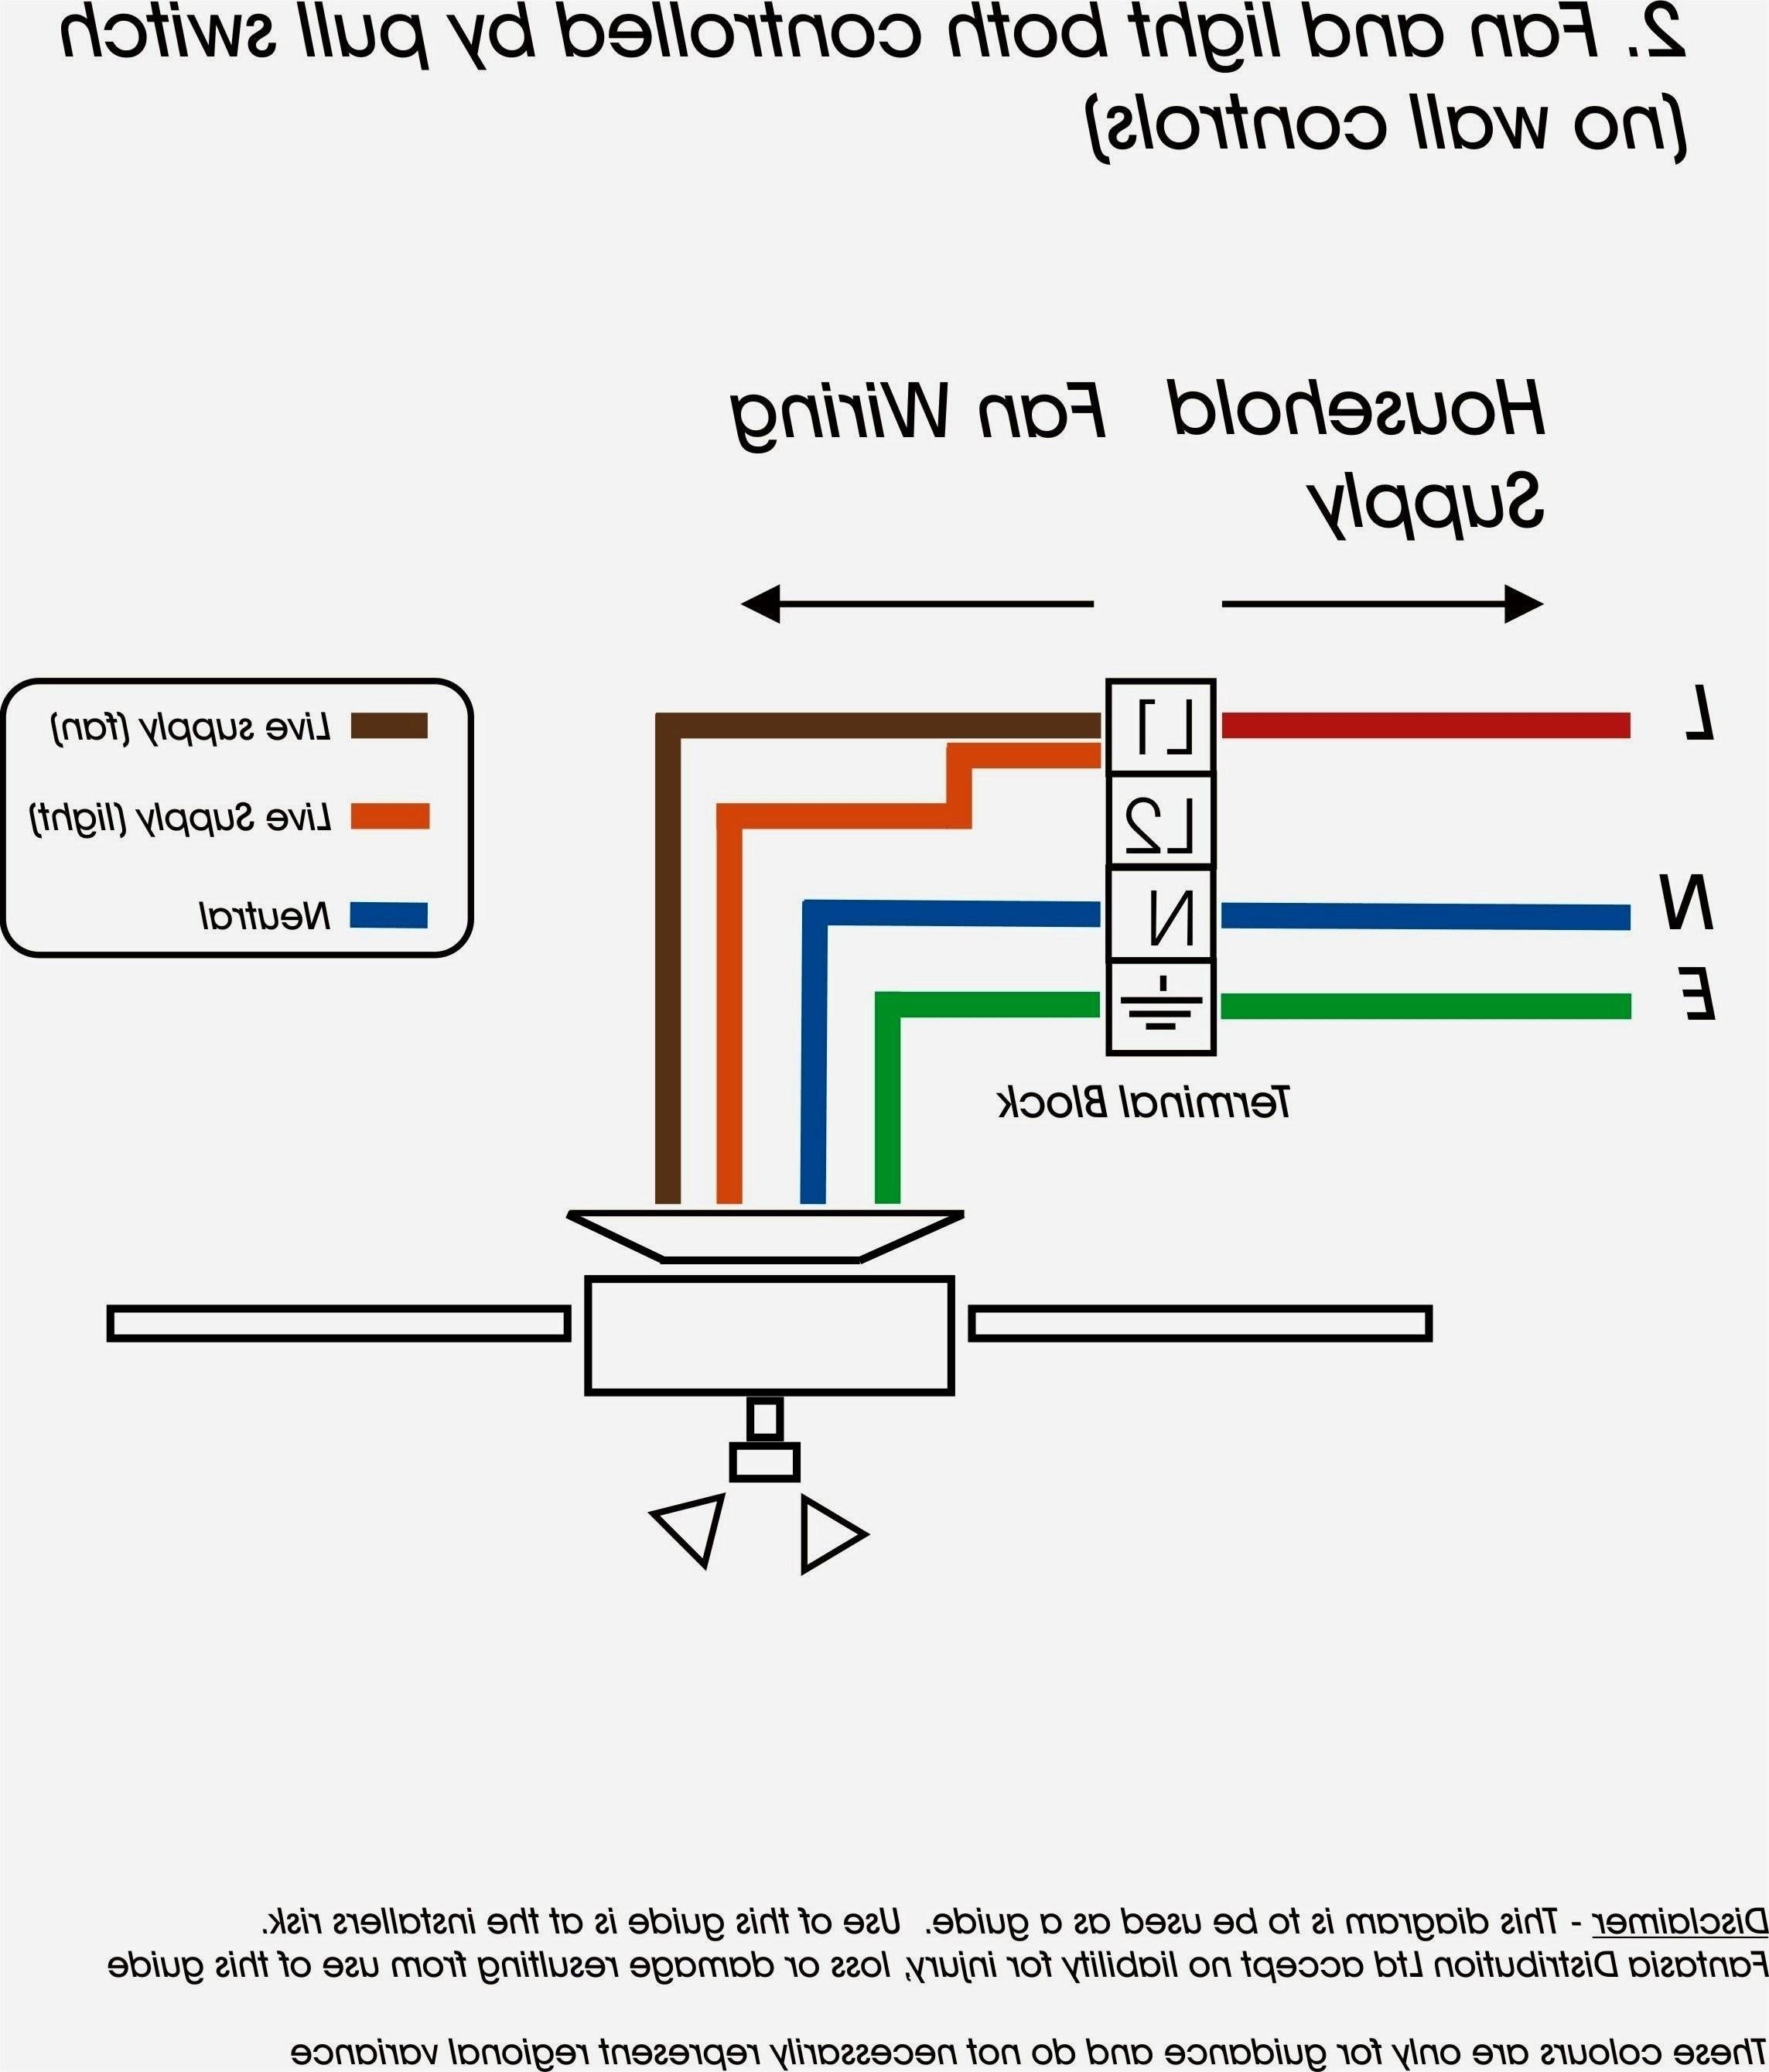 2 Gang Intermediate Light Switch Wiring Diagram Save Light Switch Wiring Diagram 2 Switches 2 Lights